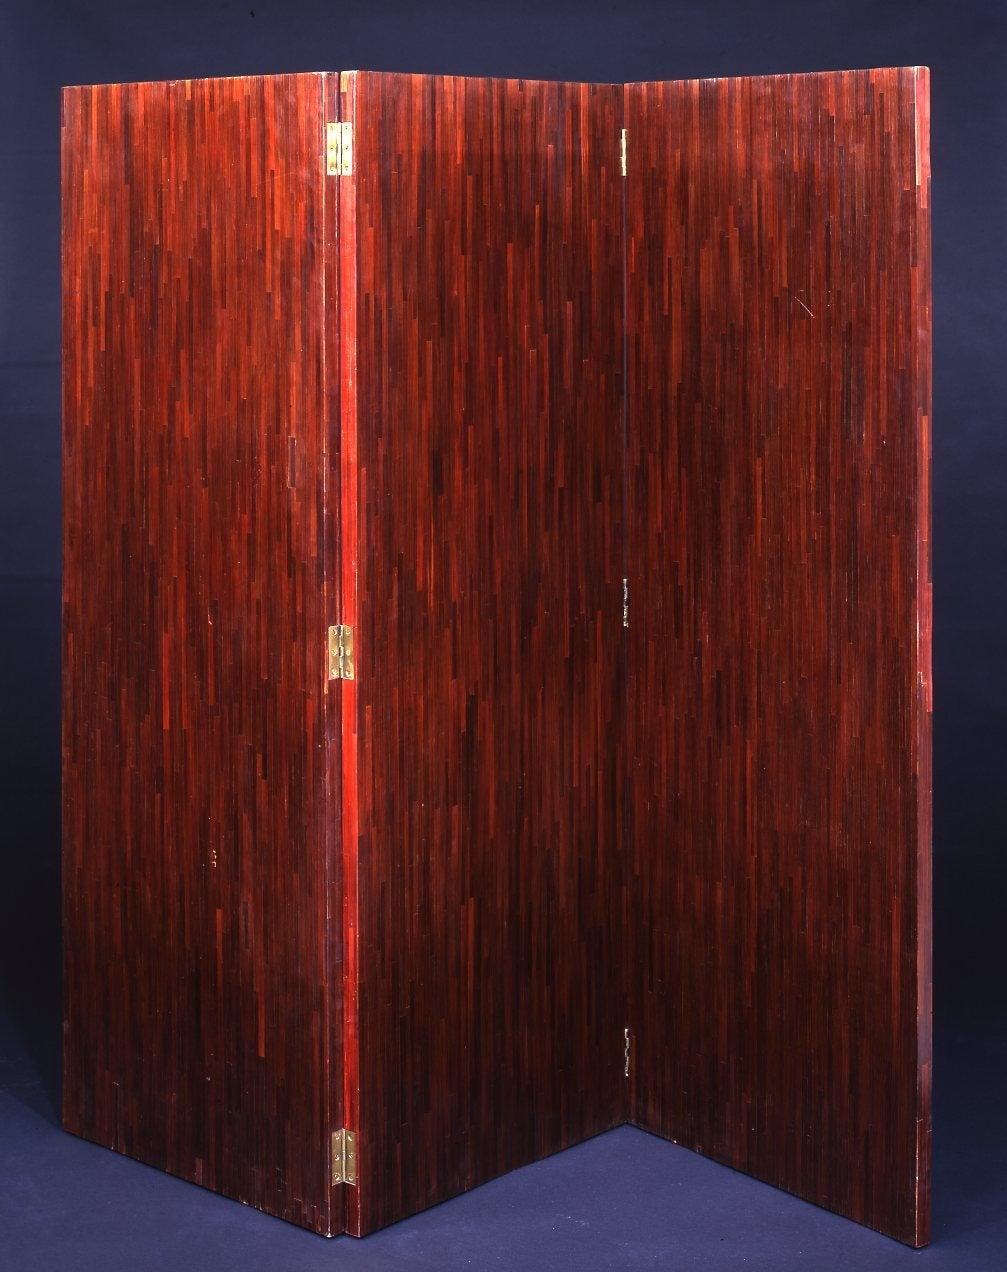 Art Deco Jean-Michel Frank, Straw Marquetry Folding Screen For Sale